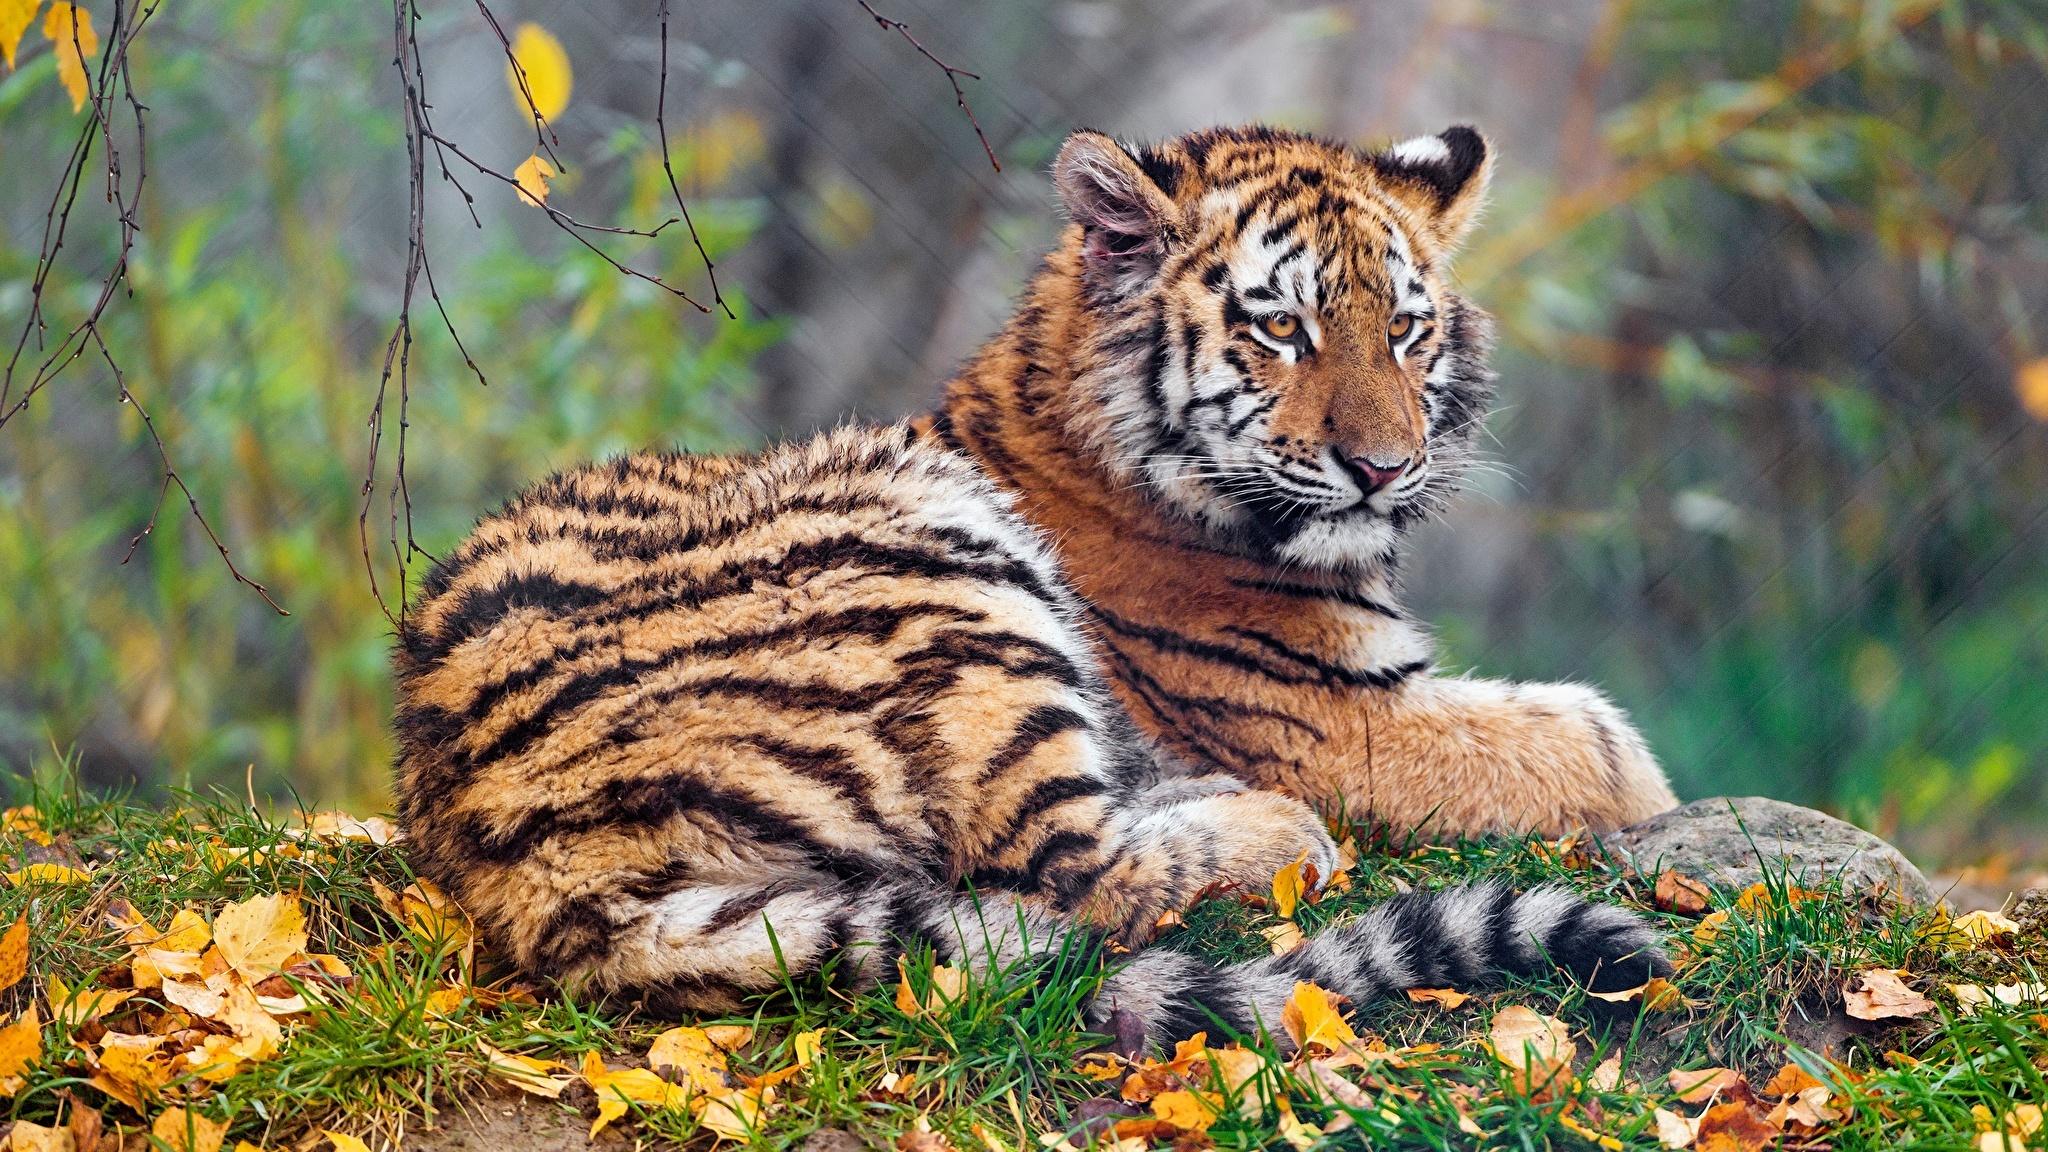 Animal In Autumn best picture